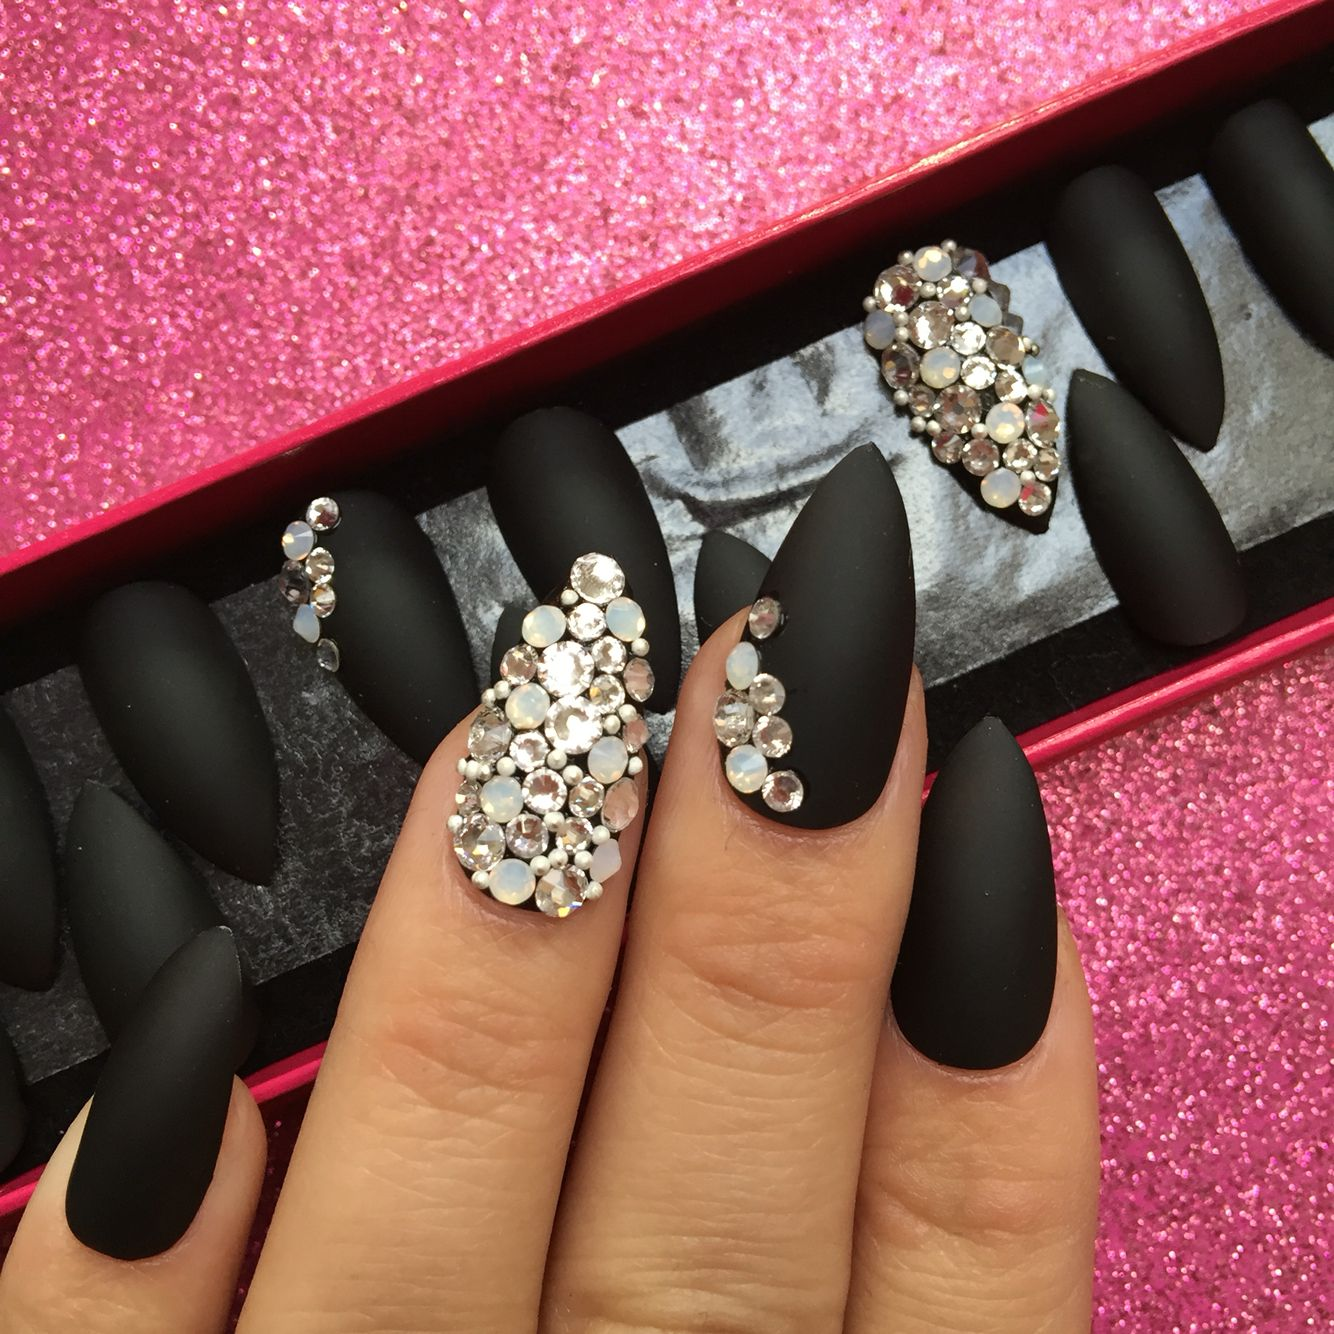 Black dress nails - Prom Nails Matte Black Nails With Swarovski Crystals Www Nailituk Co